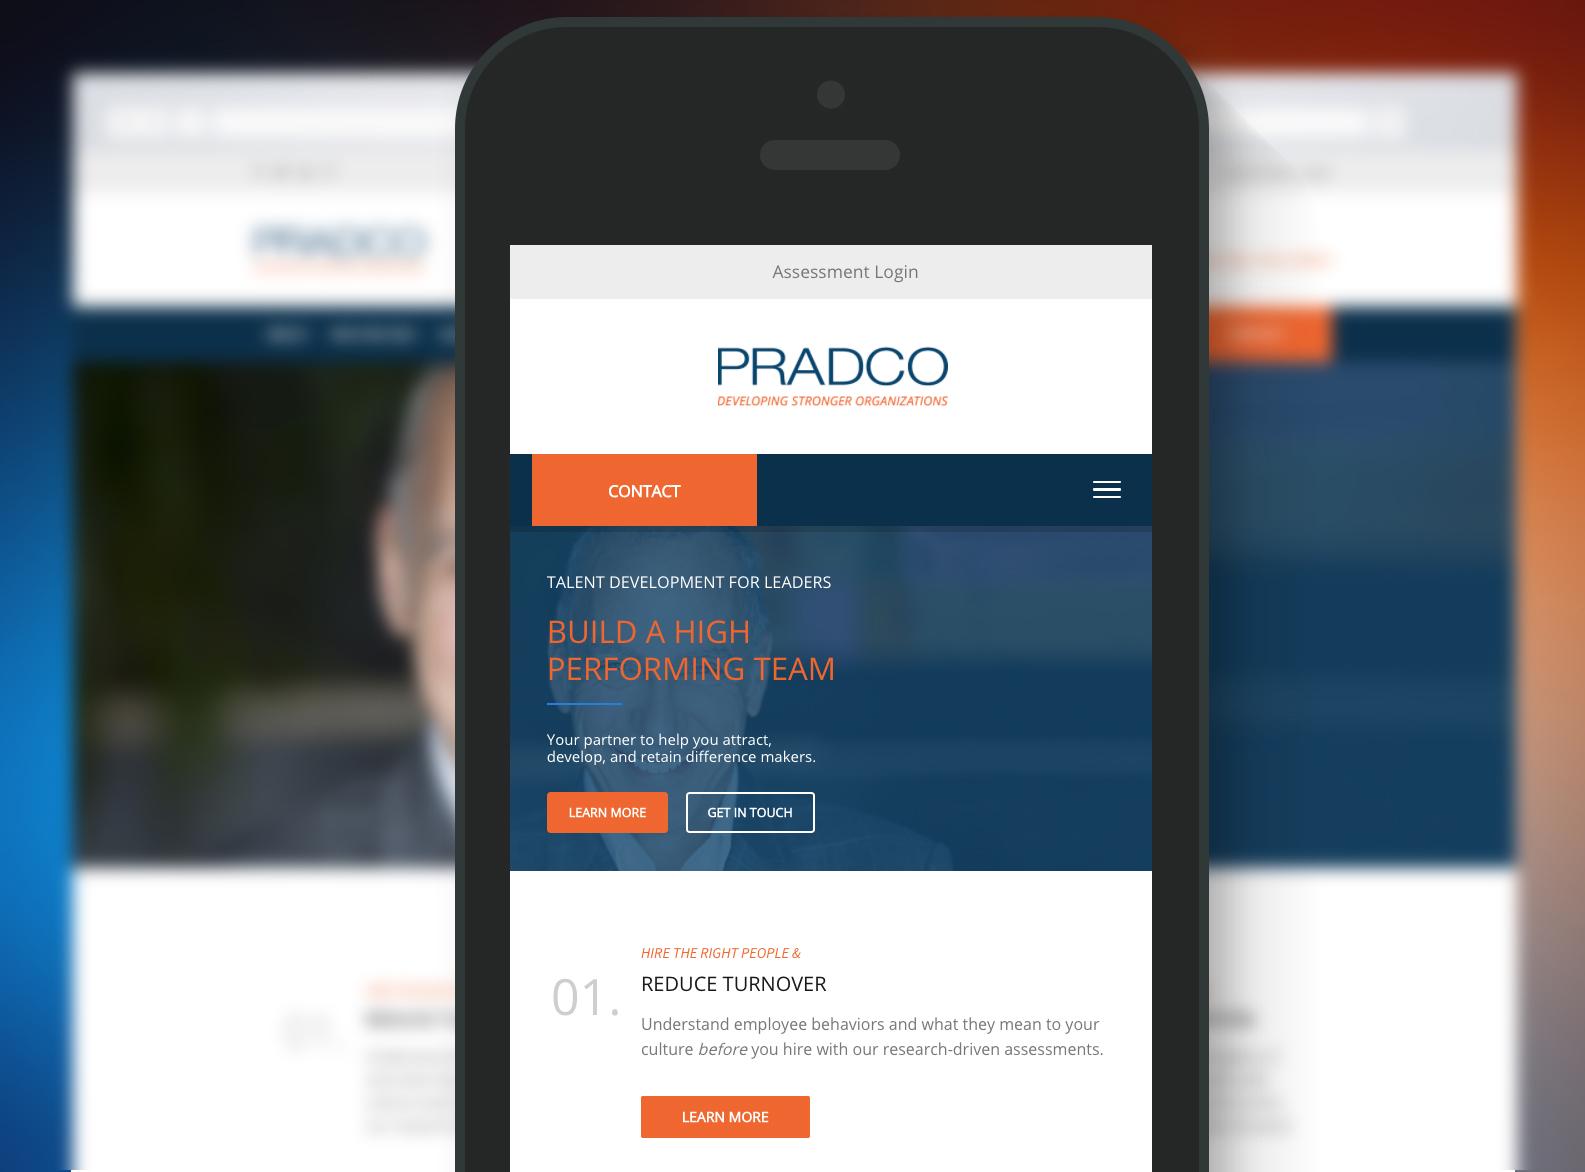 PRADCO Website Mobile